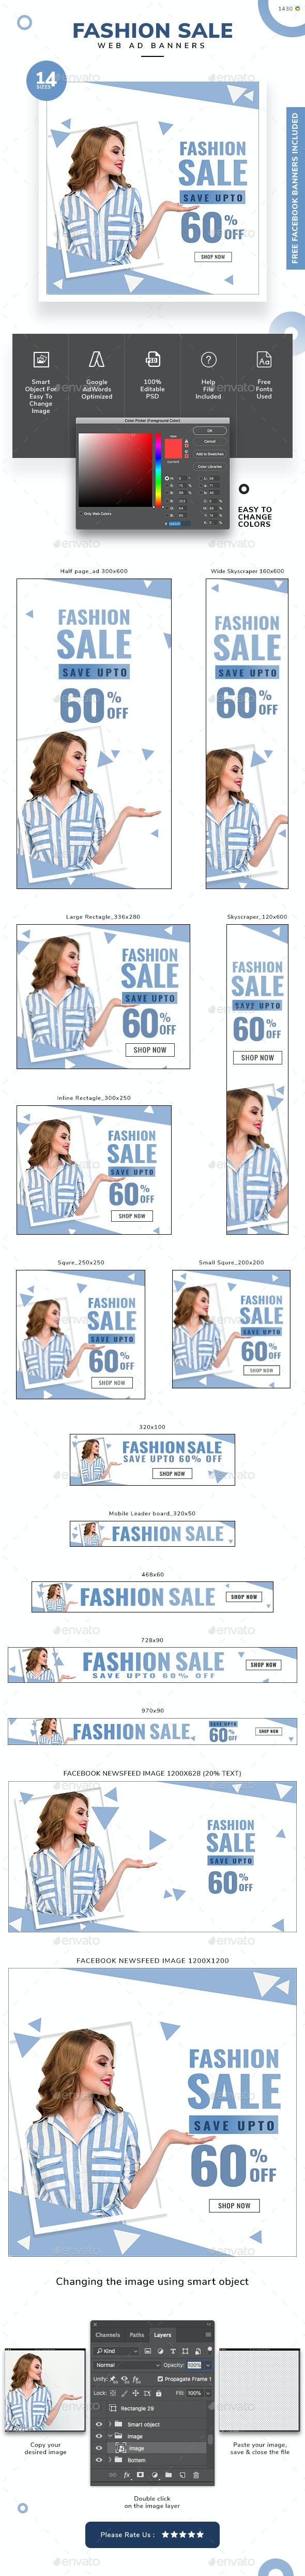 Fashion Sale Web Banner Set - Banners & Ads Web Elements